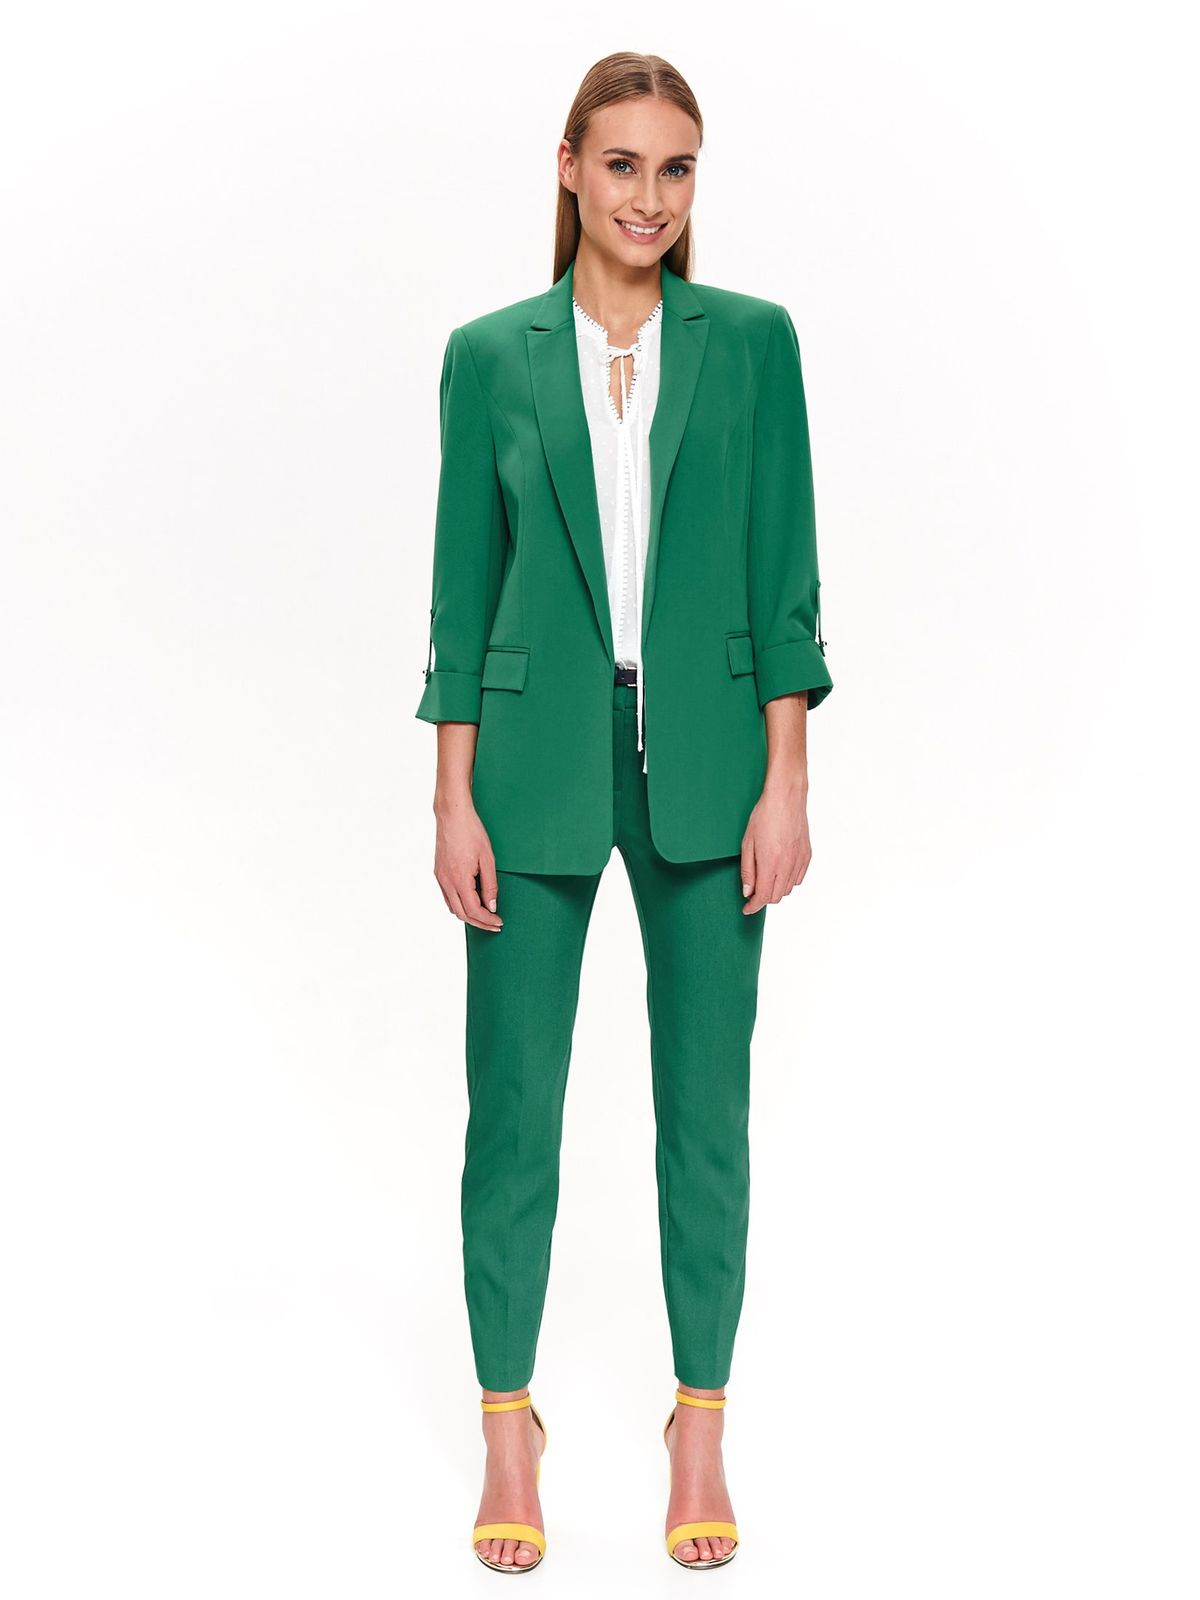 Sacou Top Secret verde elegant cu un croi drept cu maneca 3/4 din material fin la atingere